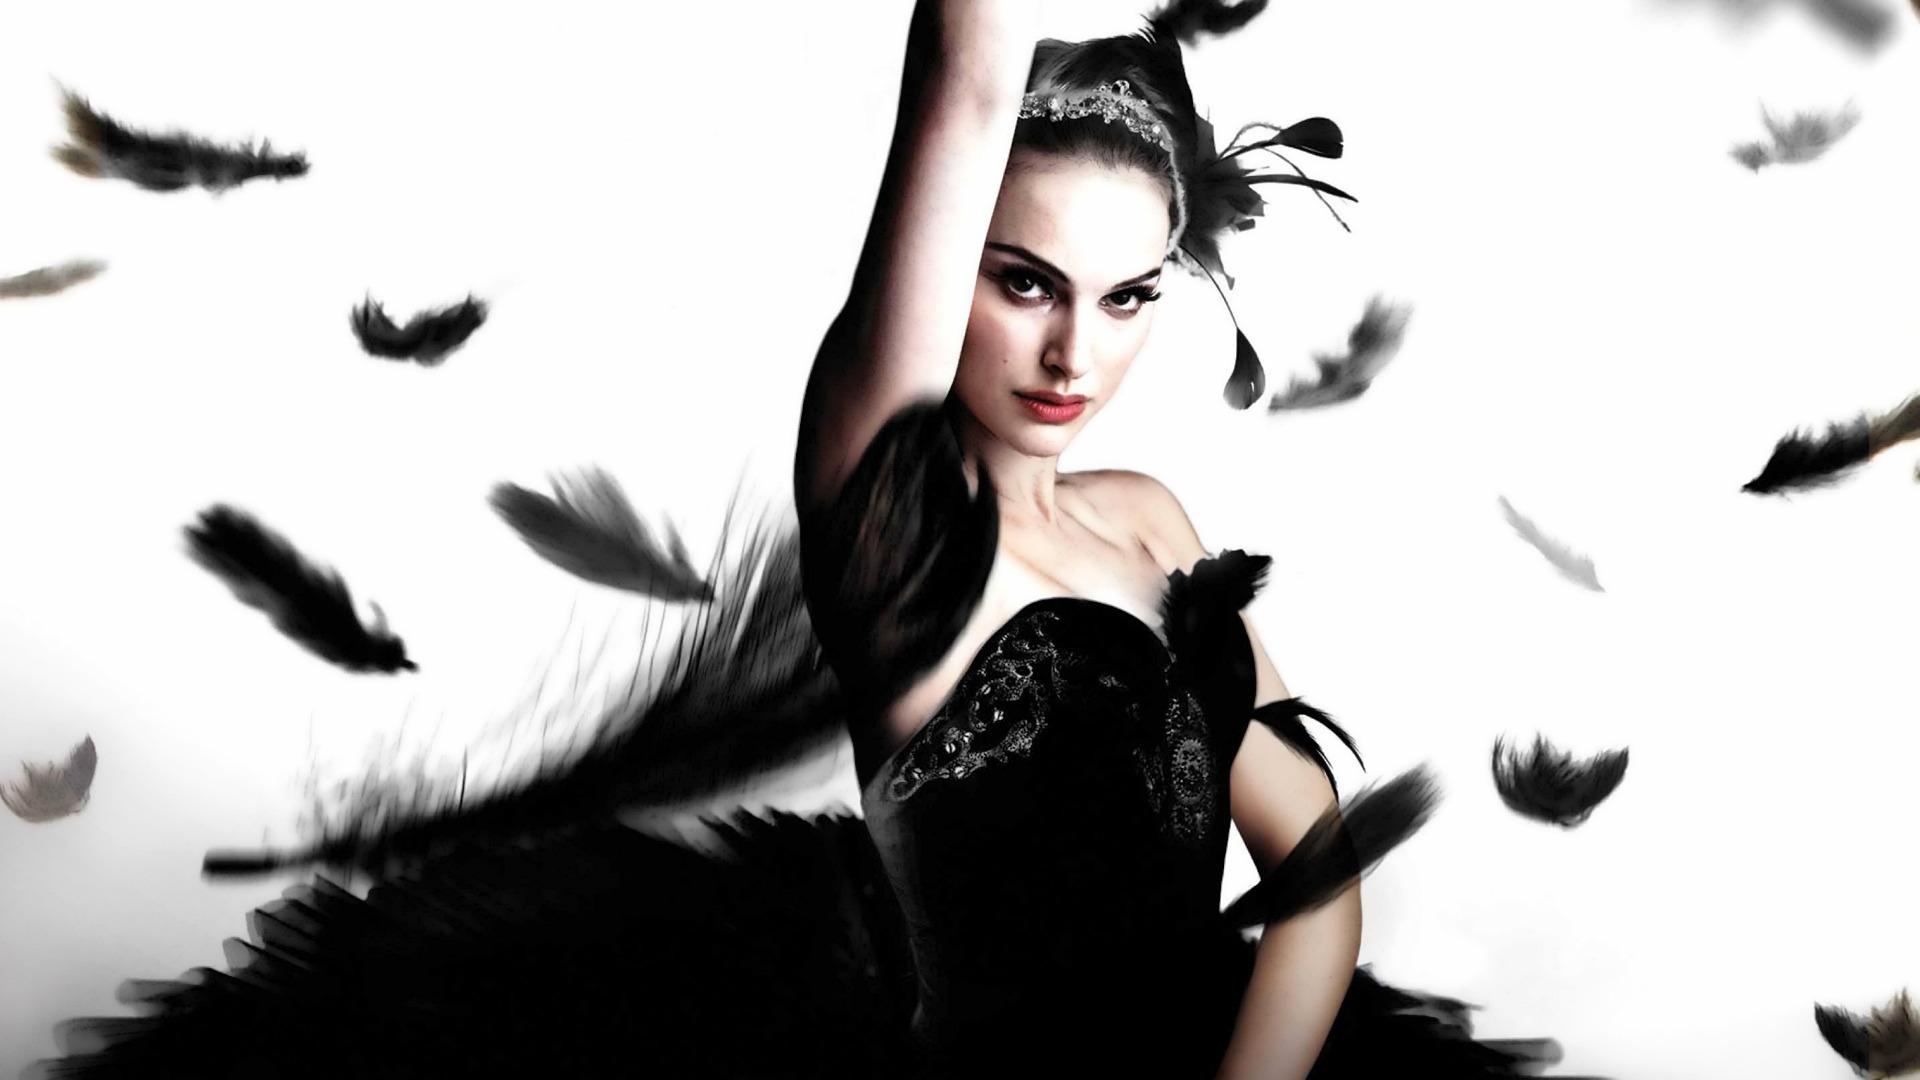 Natalie Portman Black Swan Dancing Natalie Portman The Black